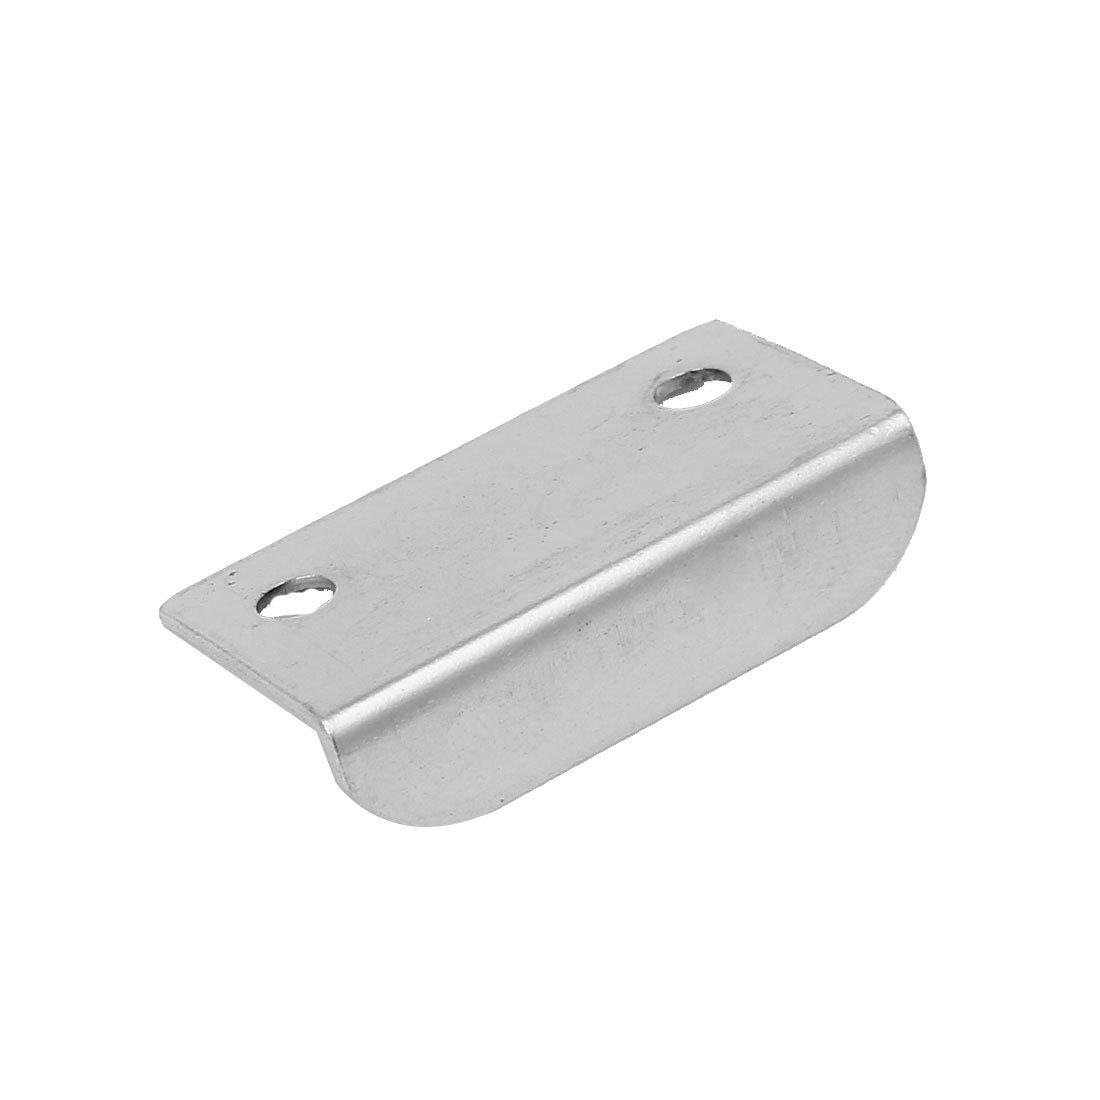 sourcingmap Door Cabinet Clasp Safety Metal Padlock Latch Hasp Staple Silver Tone